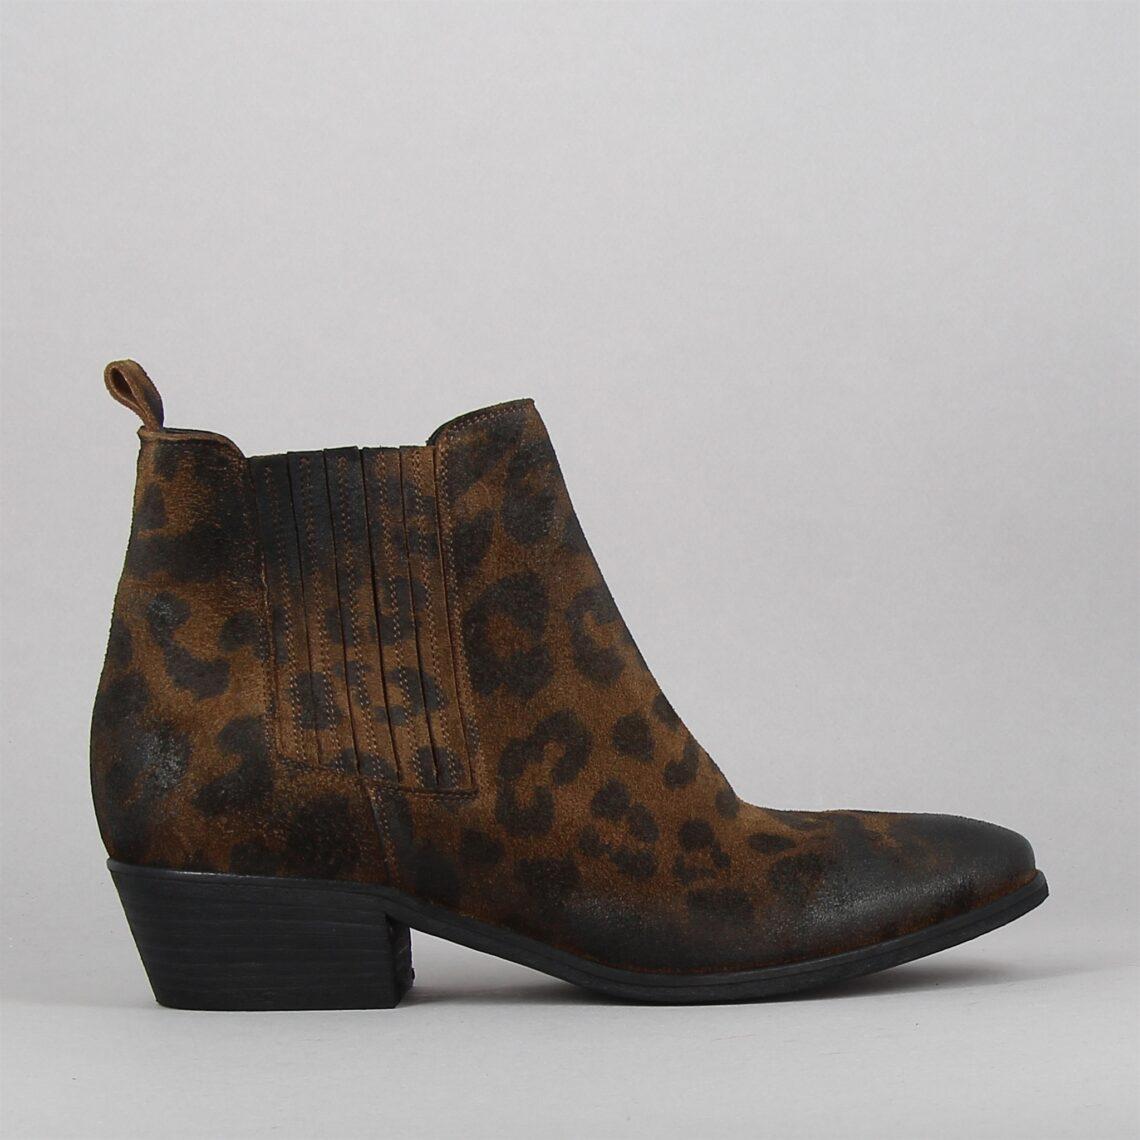 e745-19-leopard-177389570-0.jpg